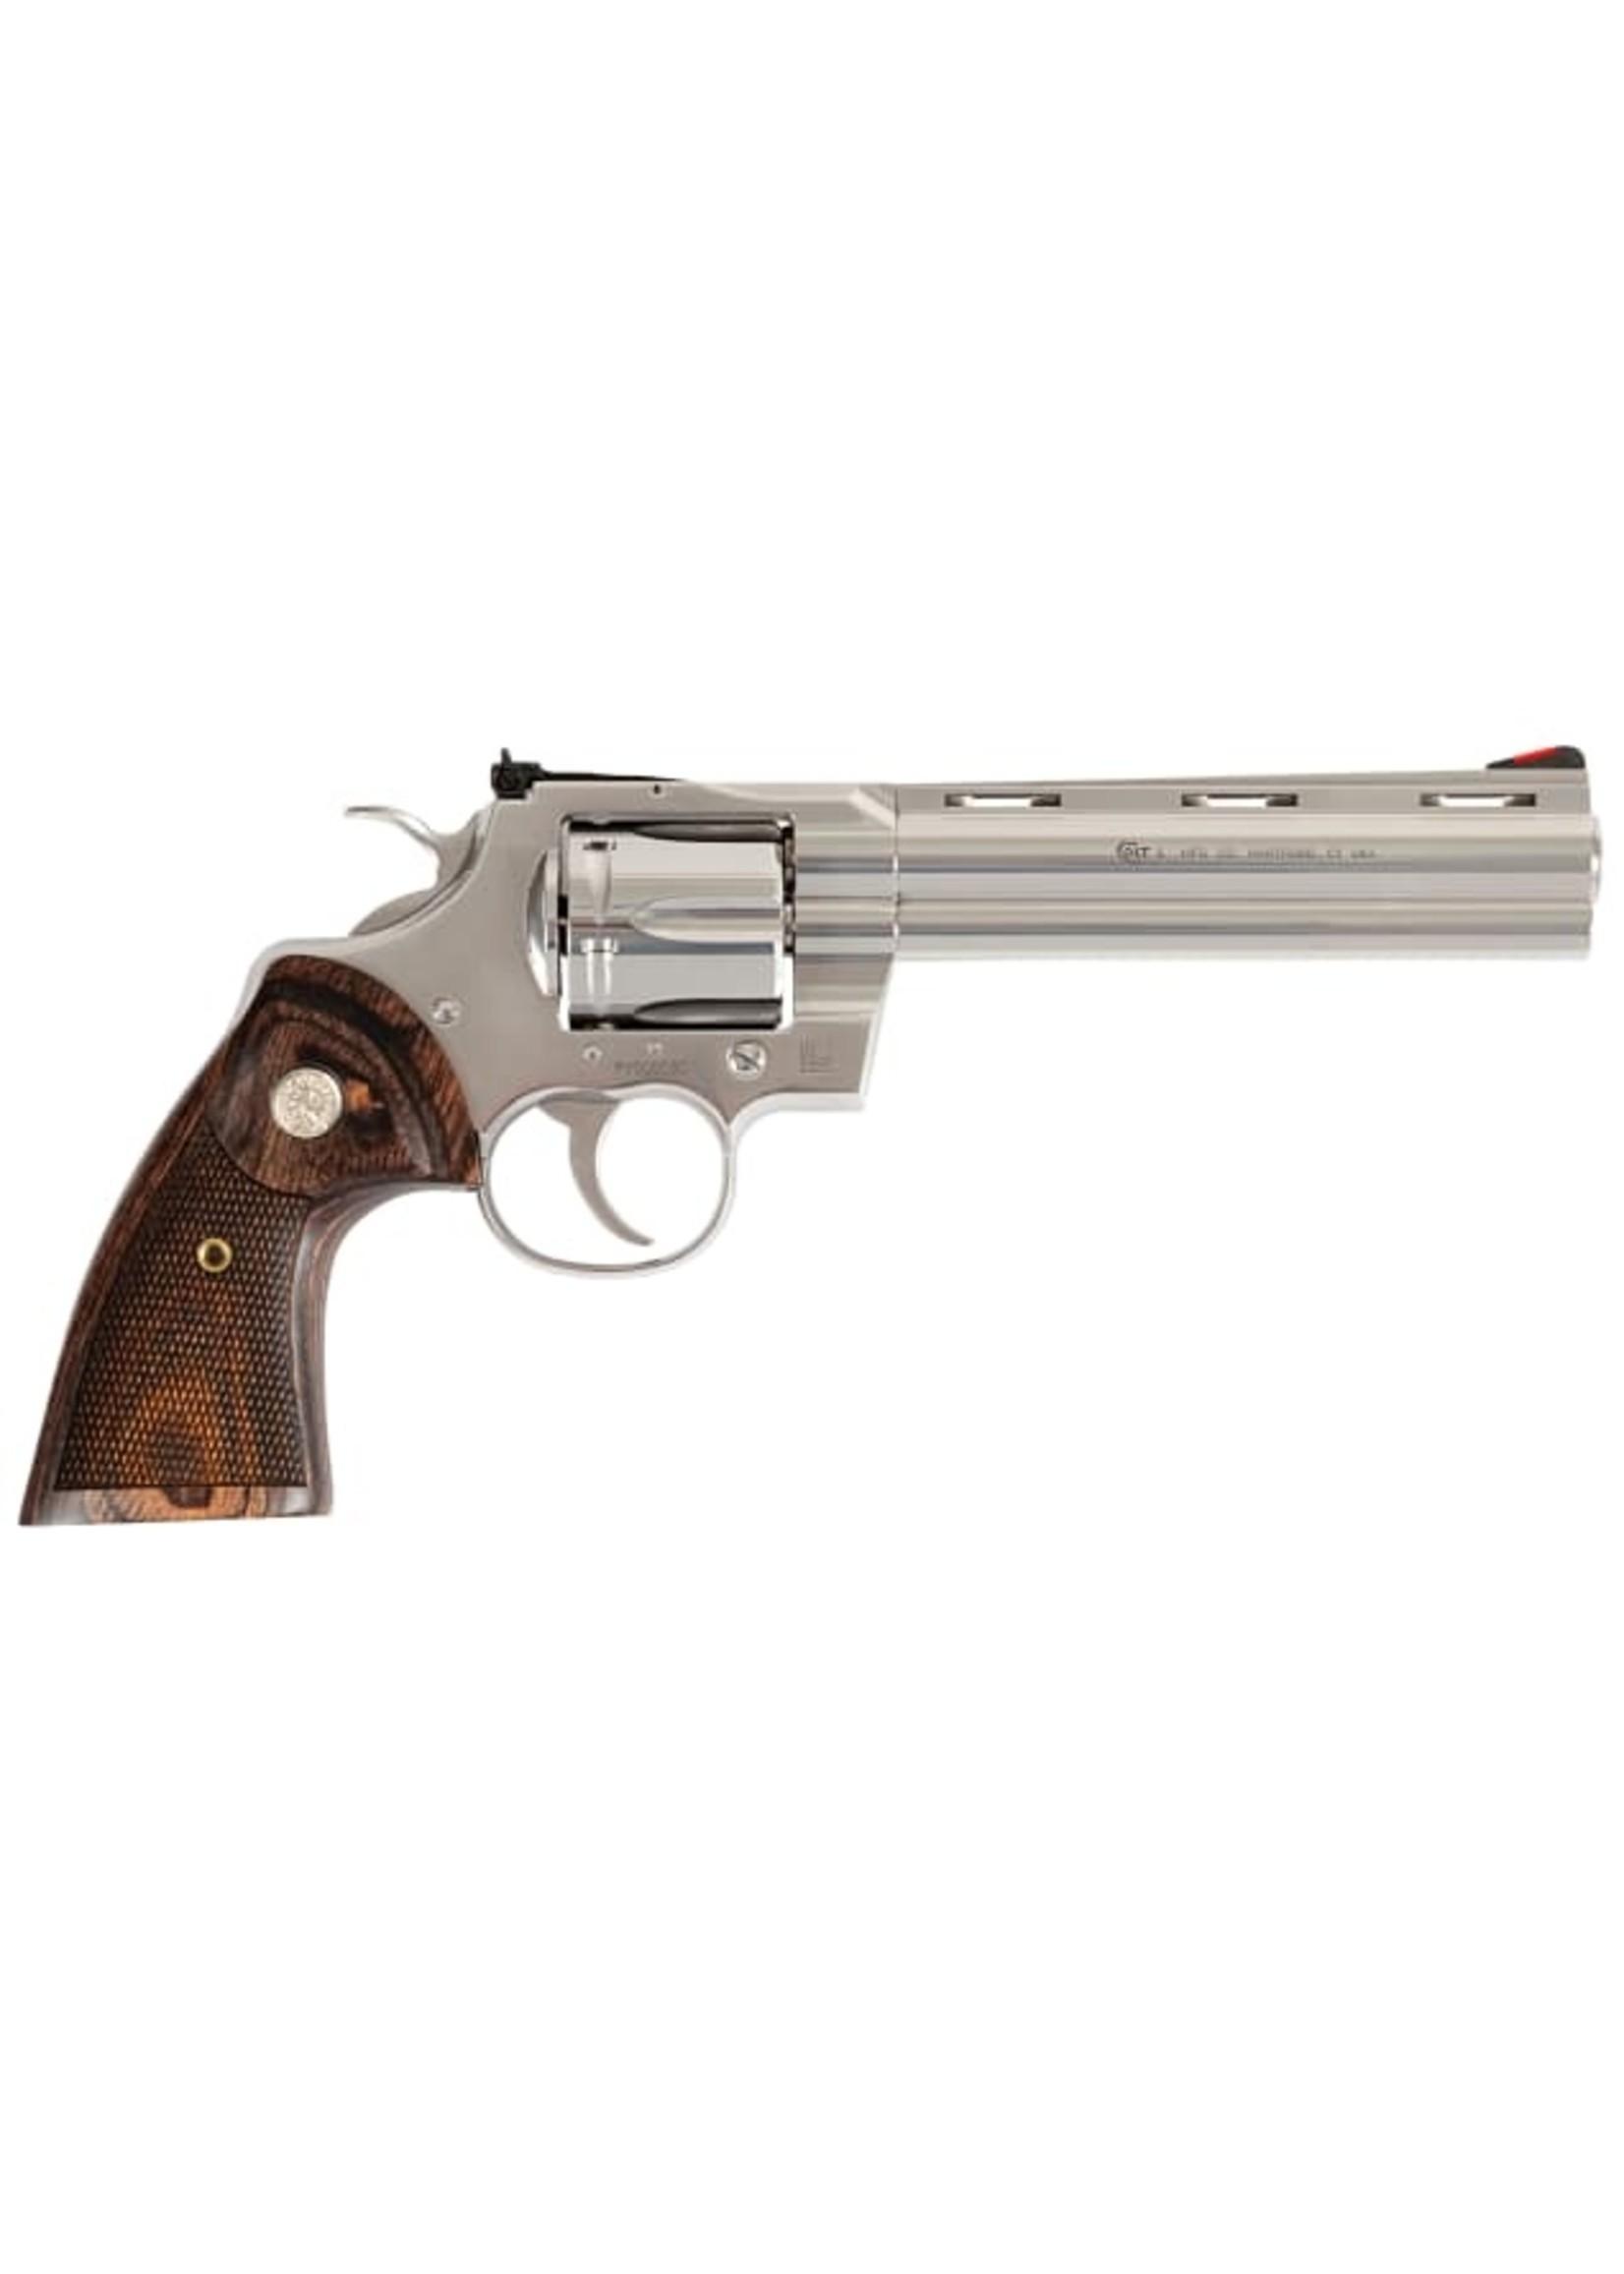 "Colt Colt Python  Revolver 357 MAG / 38 SPL, 6"" barrel, 6 Rd, Walnut Target Grip"